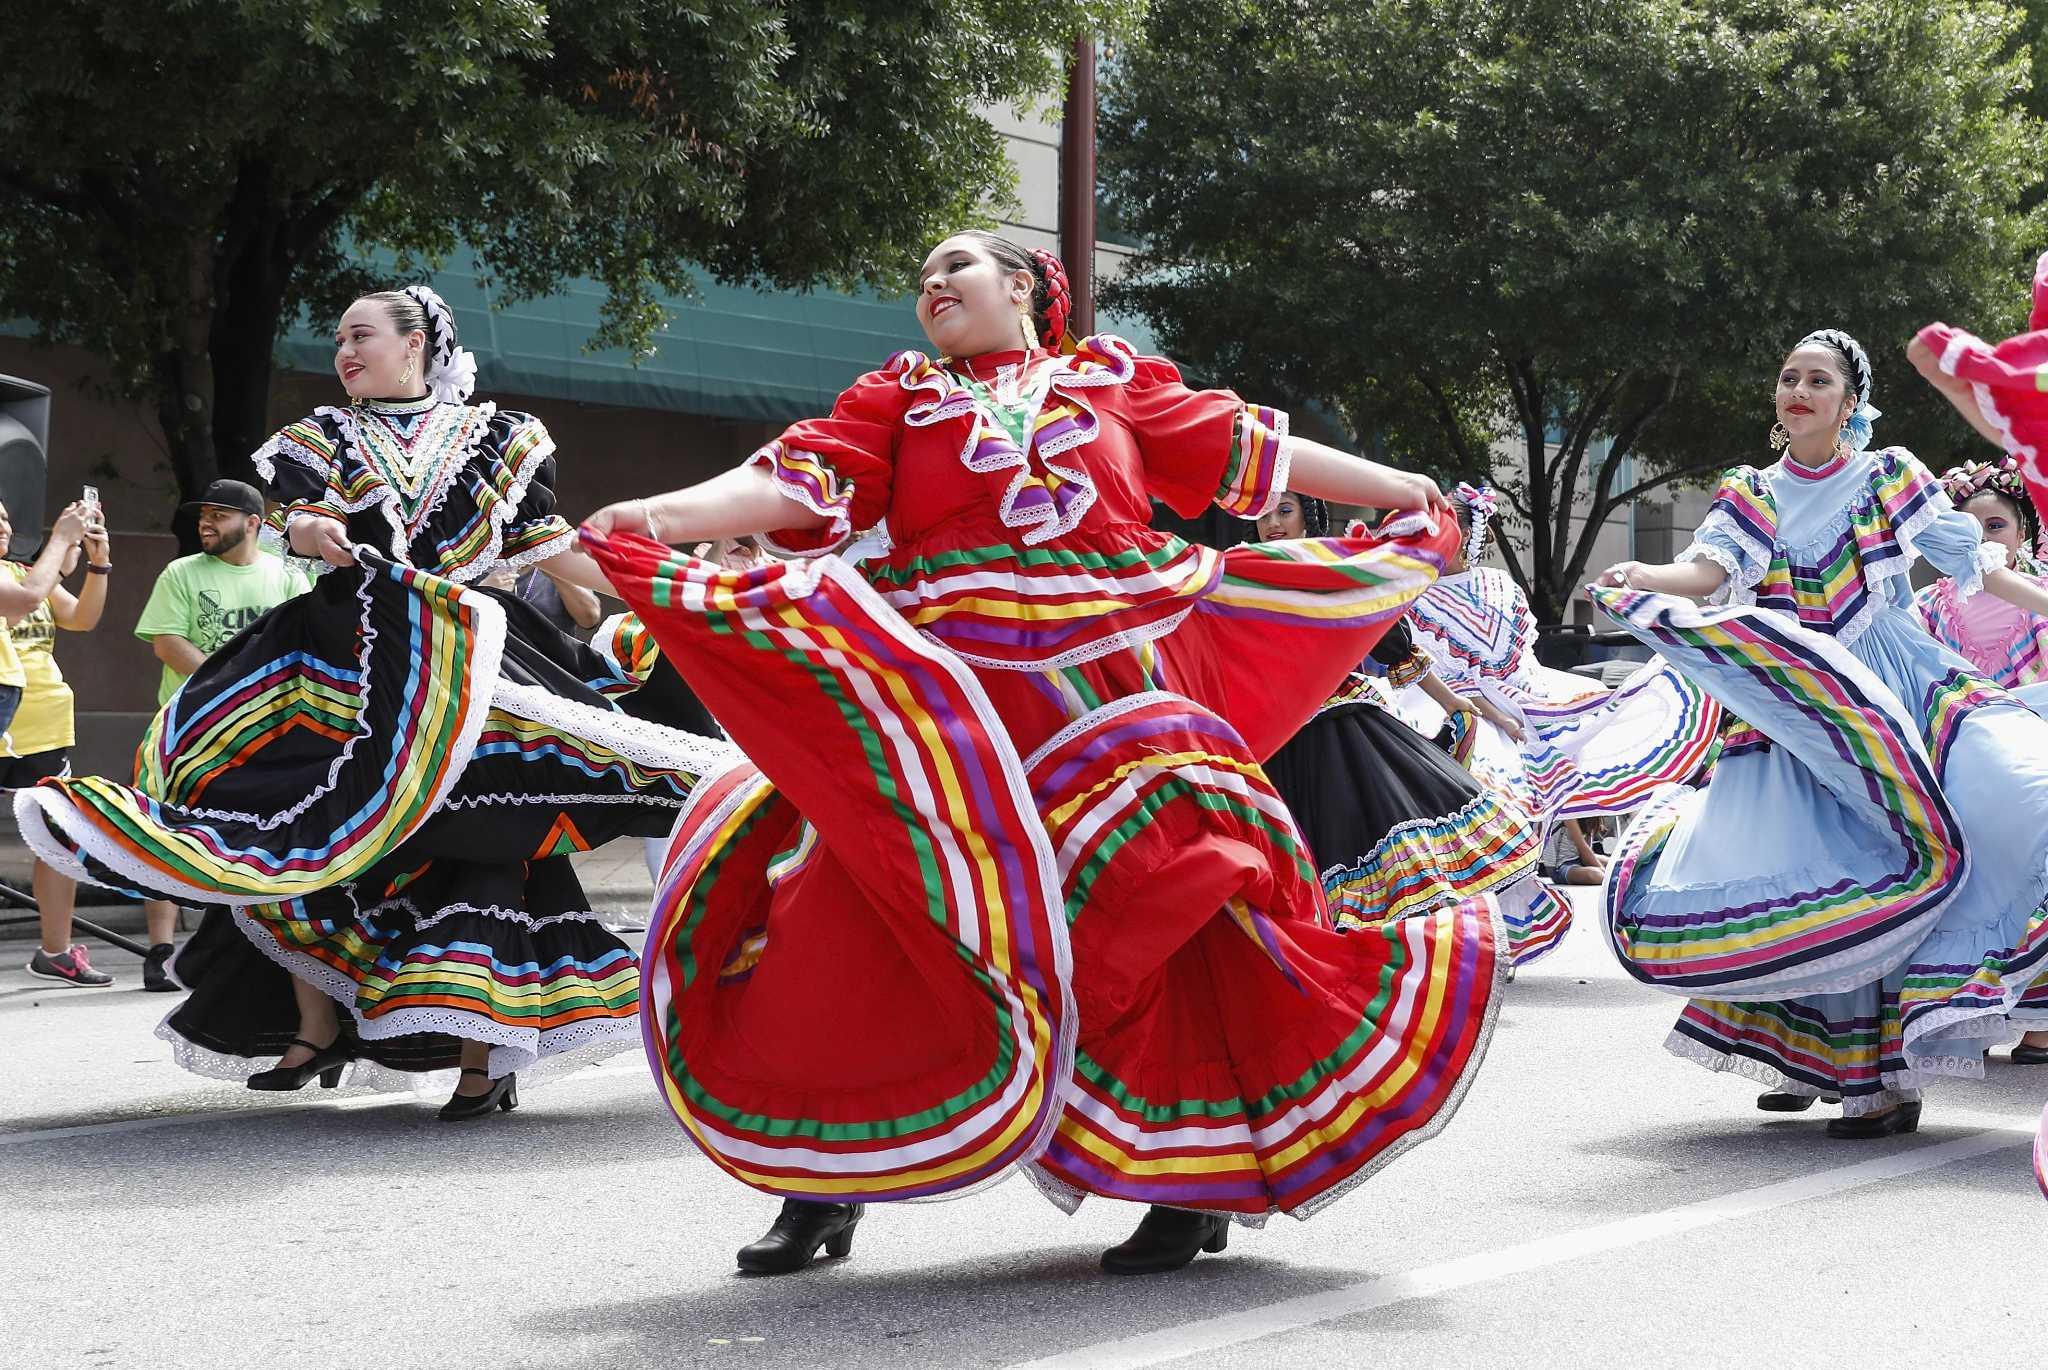 Cinco De Mayo Parade A Colorful Expression Of Heritage